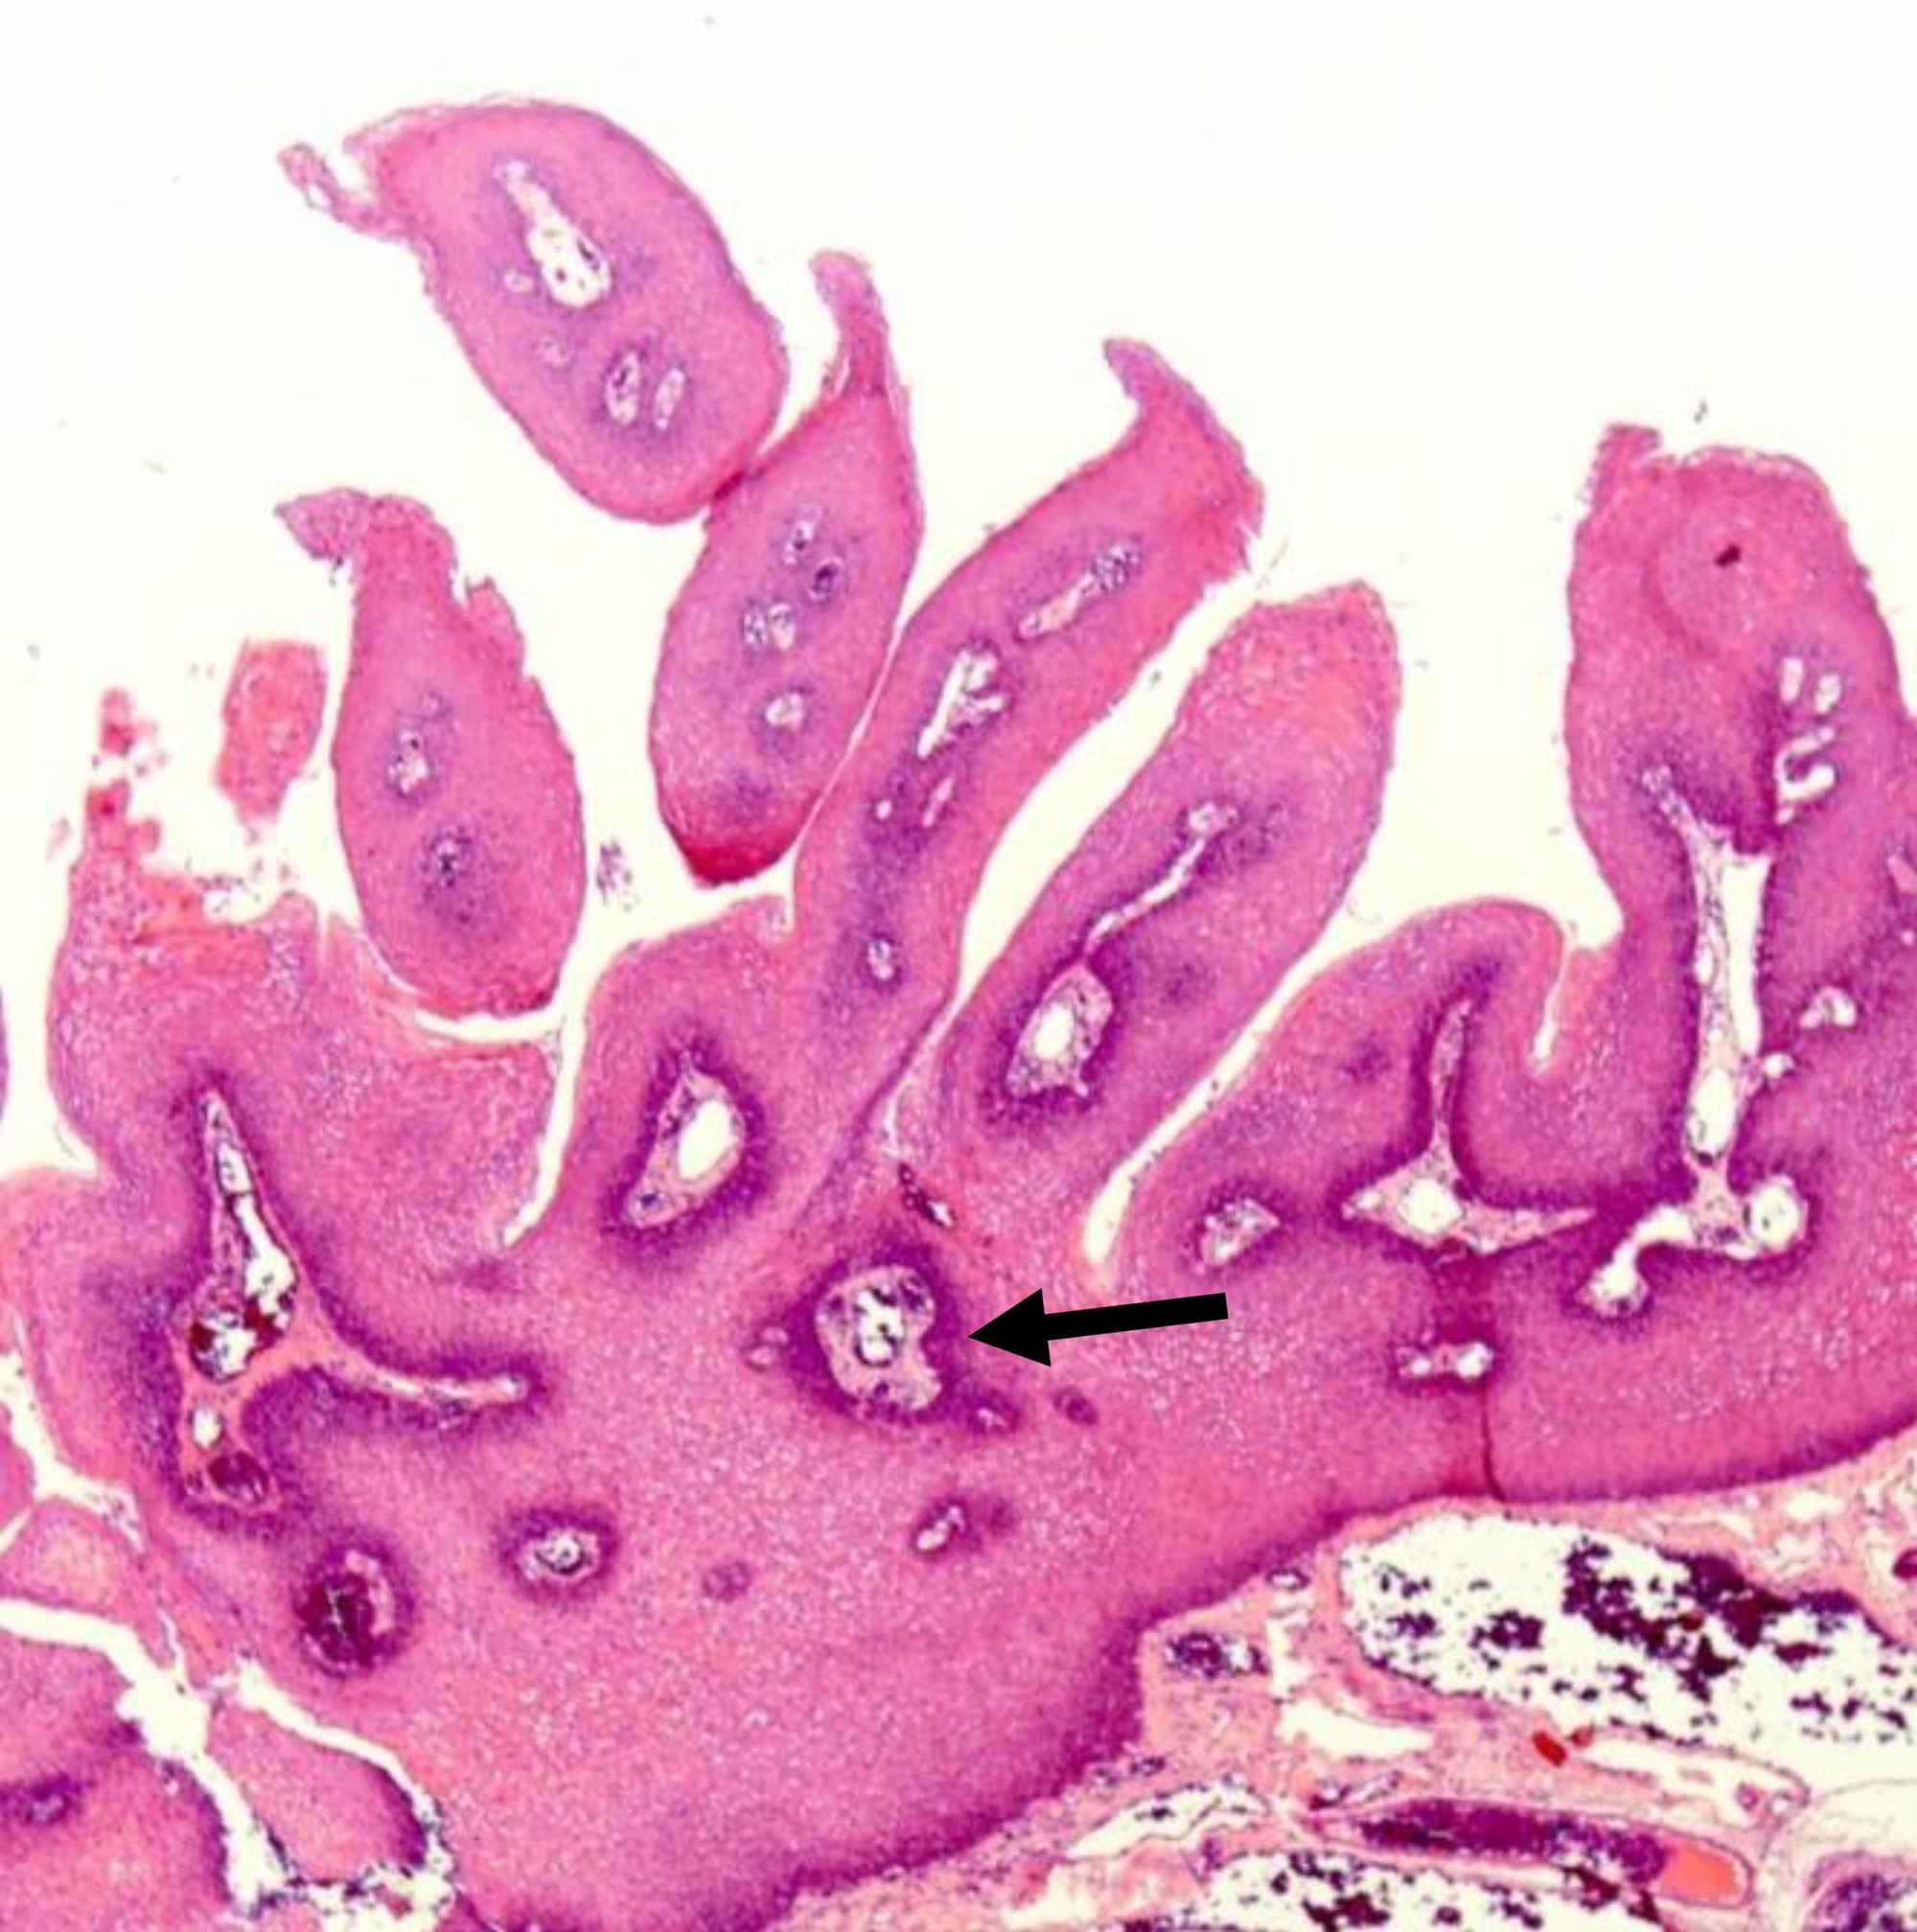 squamous papilloma uvula hpv scaly skin